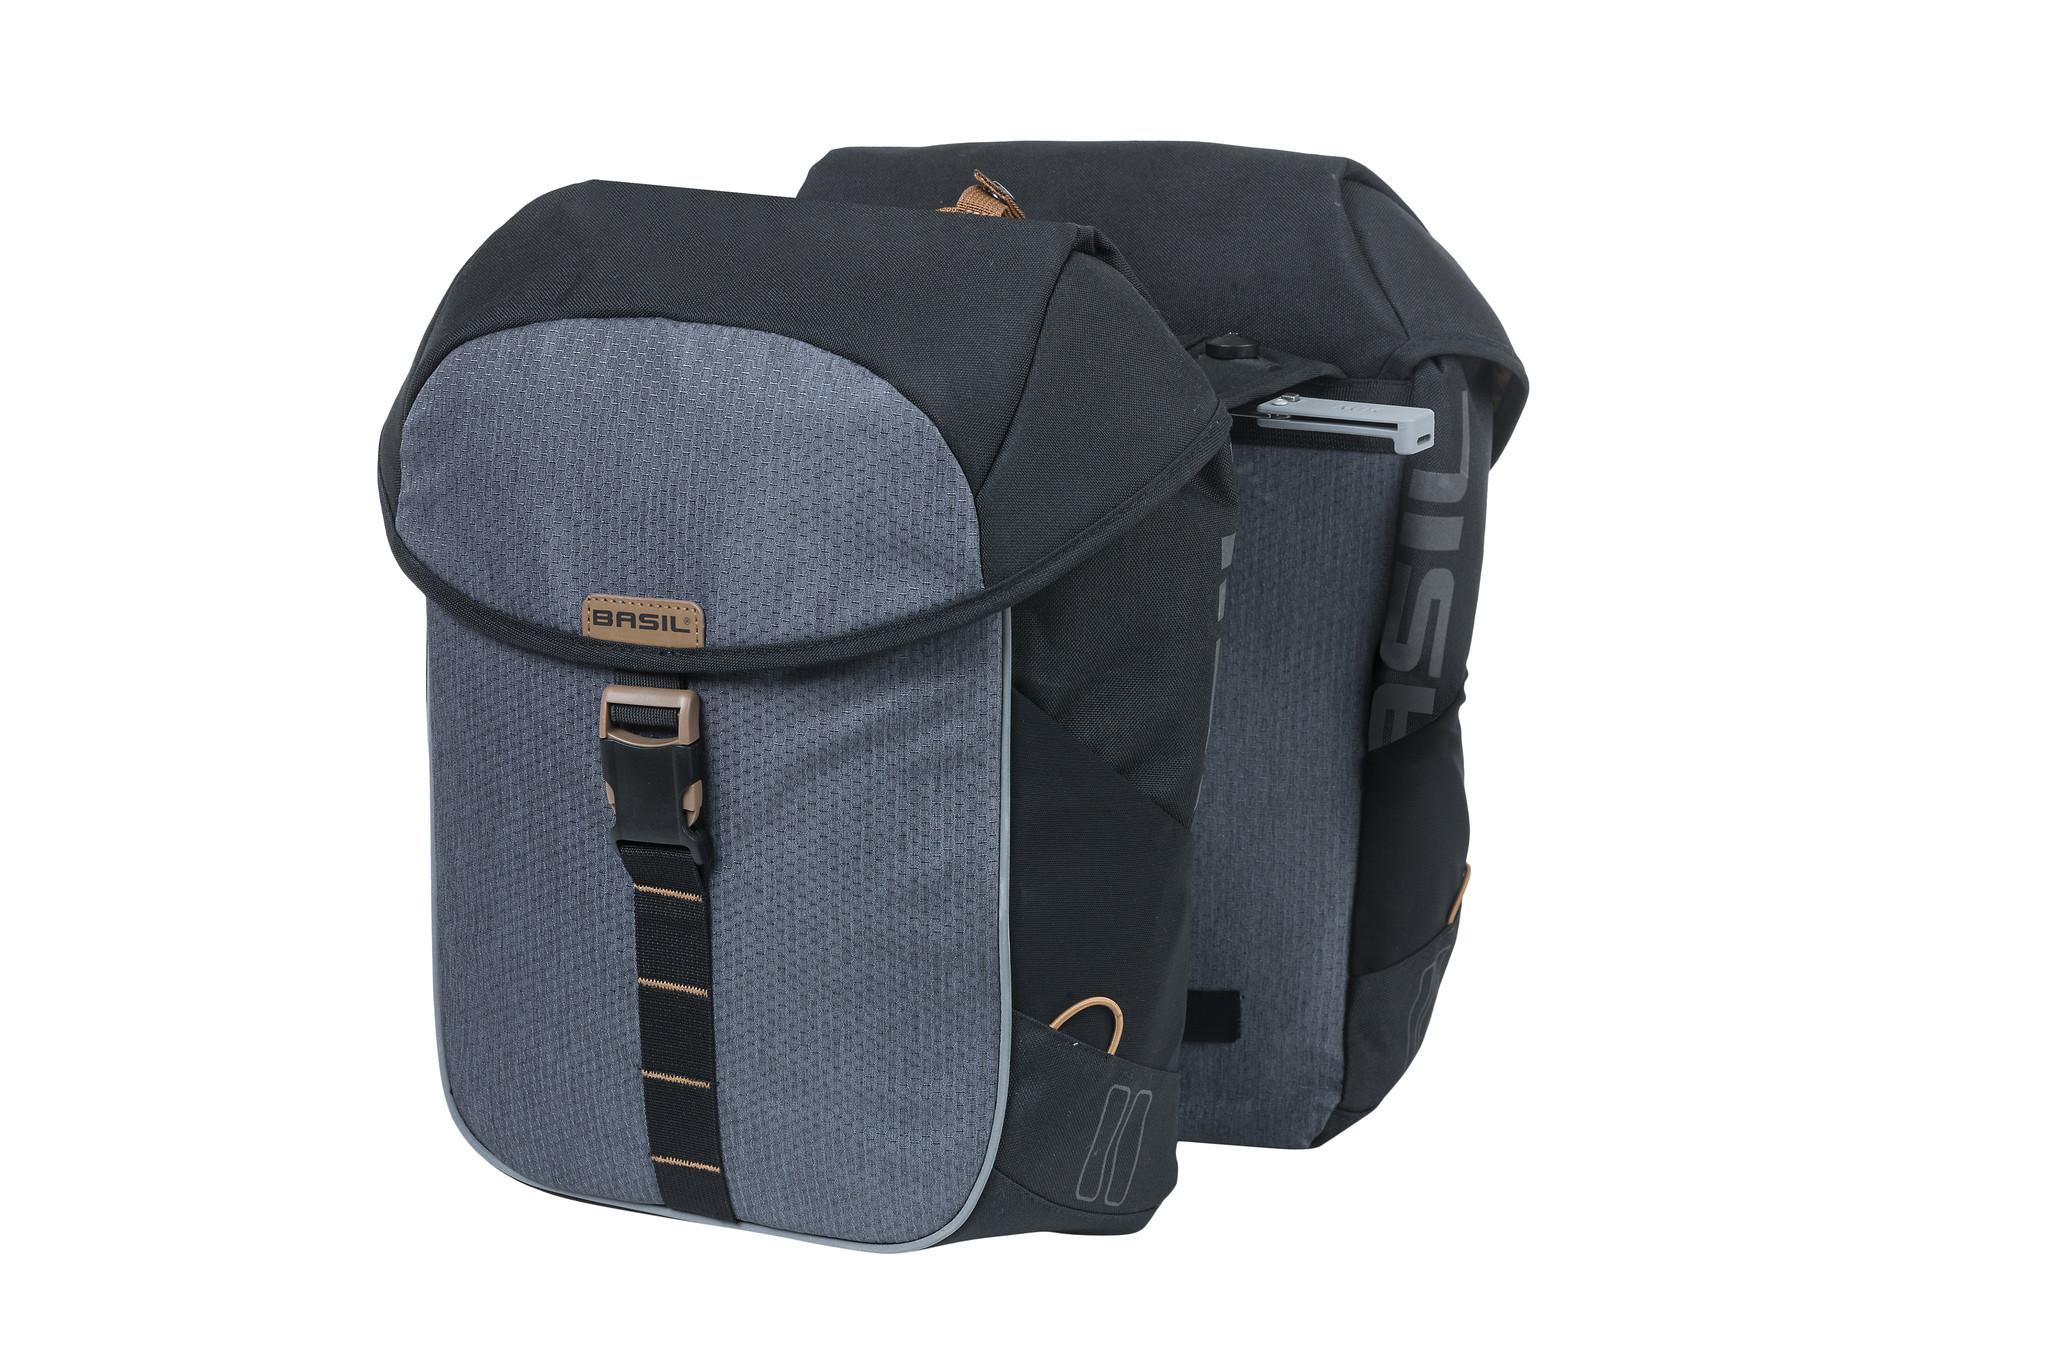 basil-miles-double-bicycle-bag-mik-34-liter-grey-b